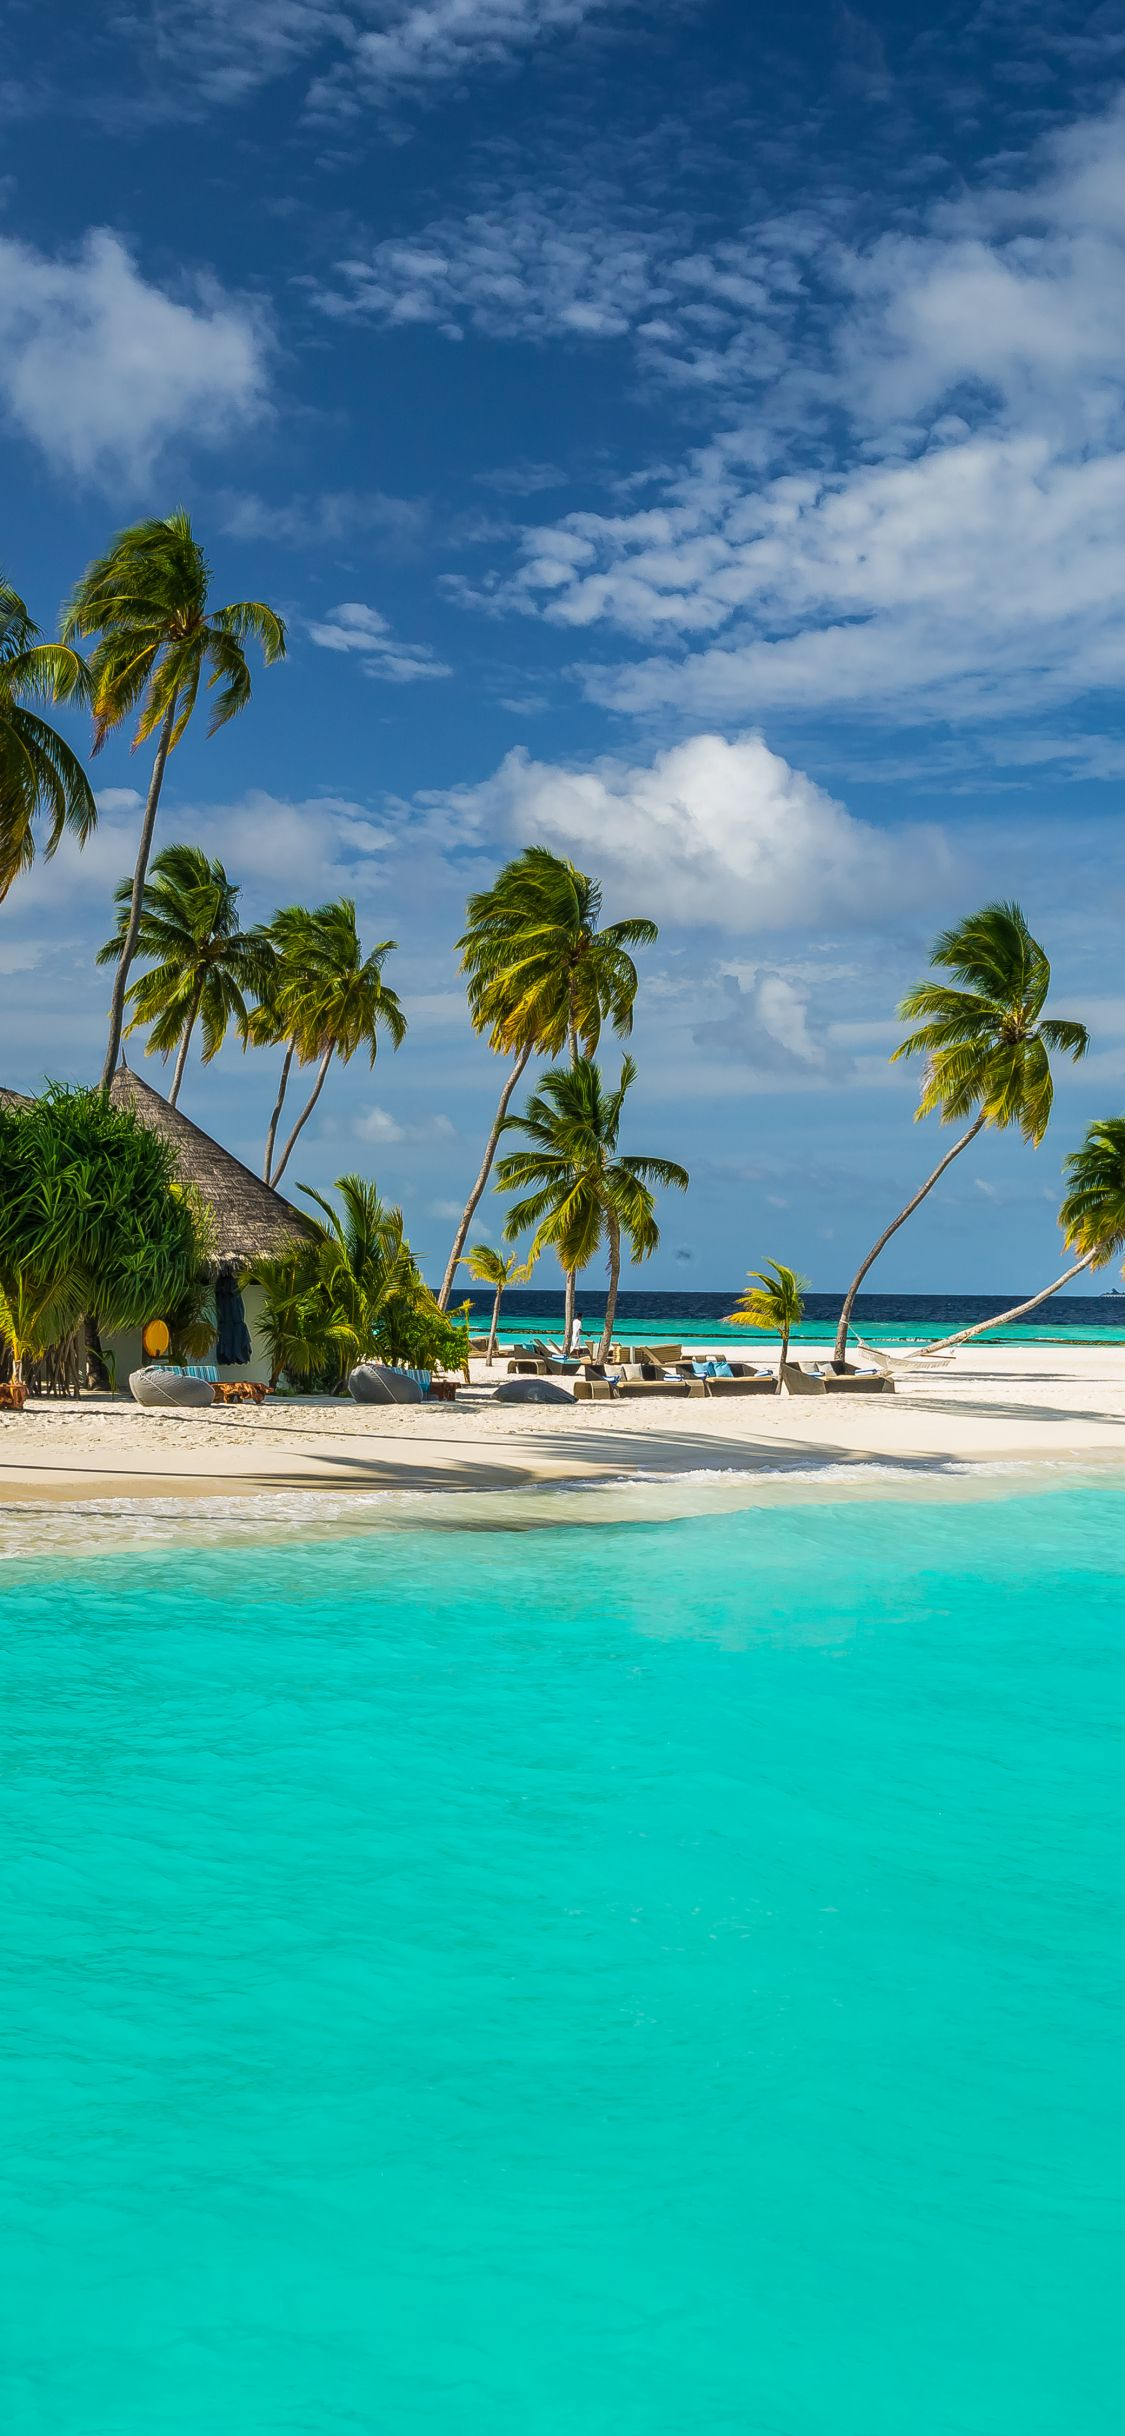 Maldives Seaside Mobile Wallpaper Sea Palm Tree Tropical Resort